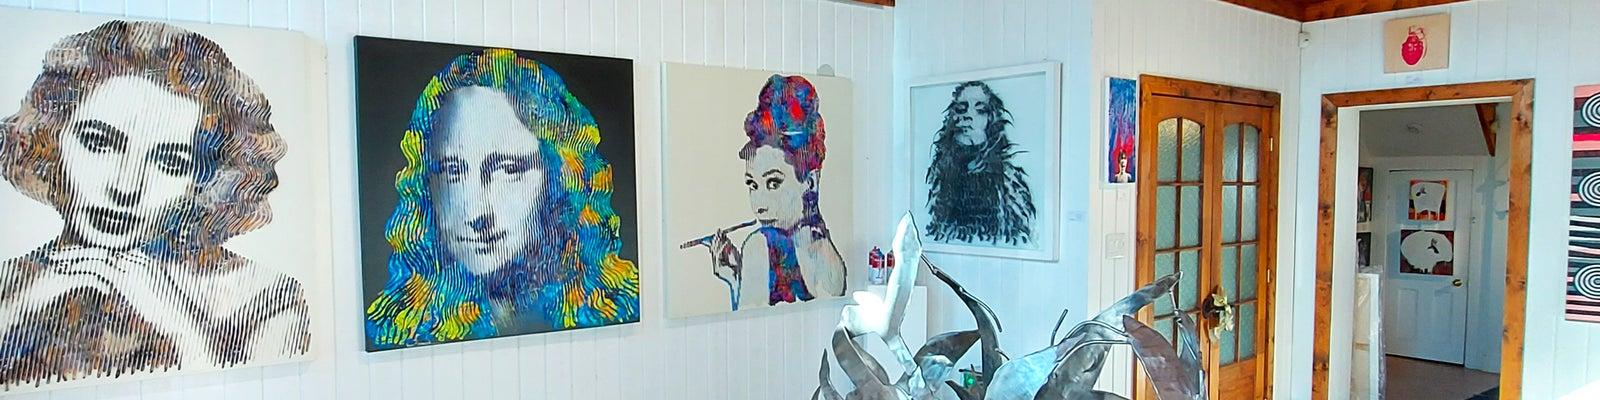 Artêria gallery